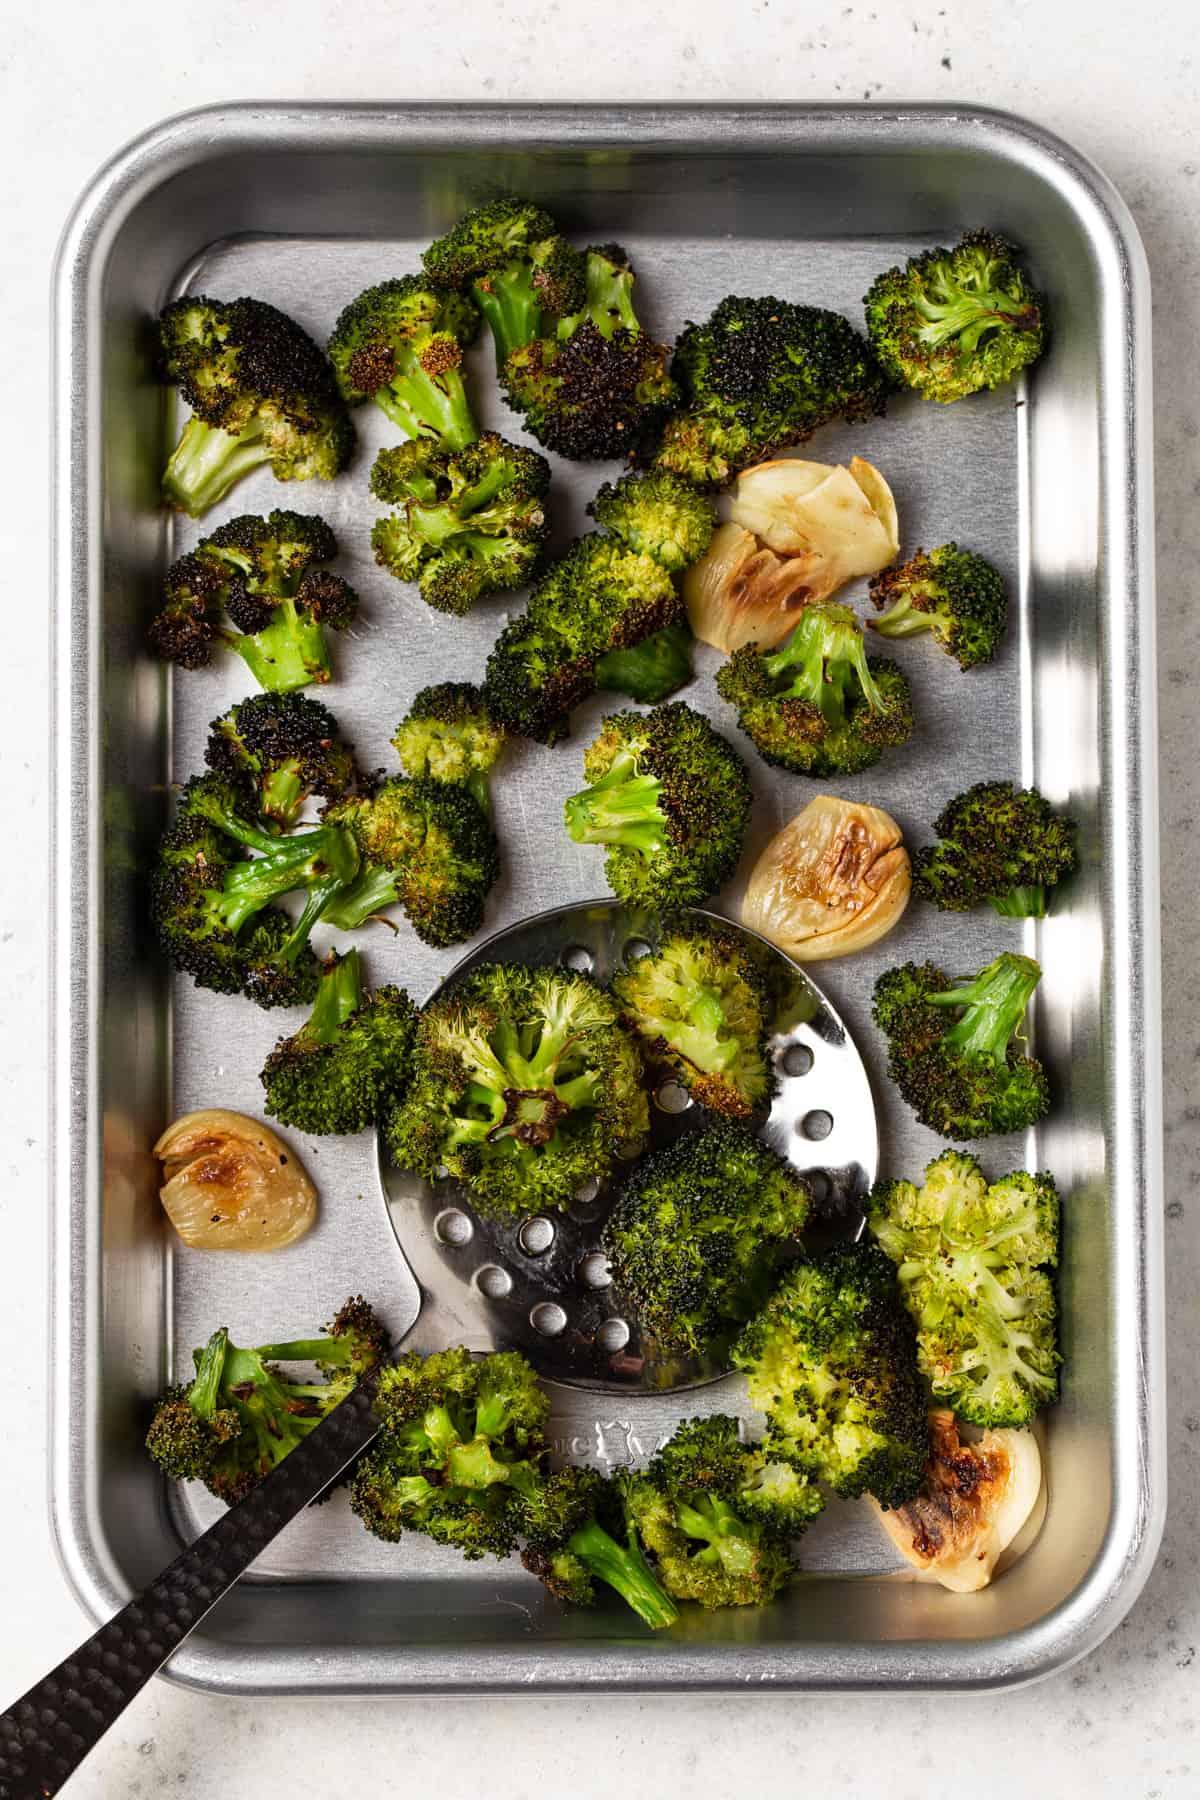 Roasted broccoli on a sheet pan.